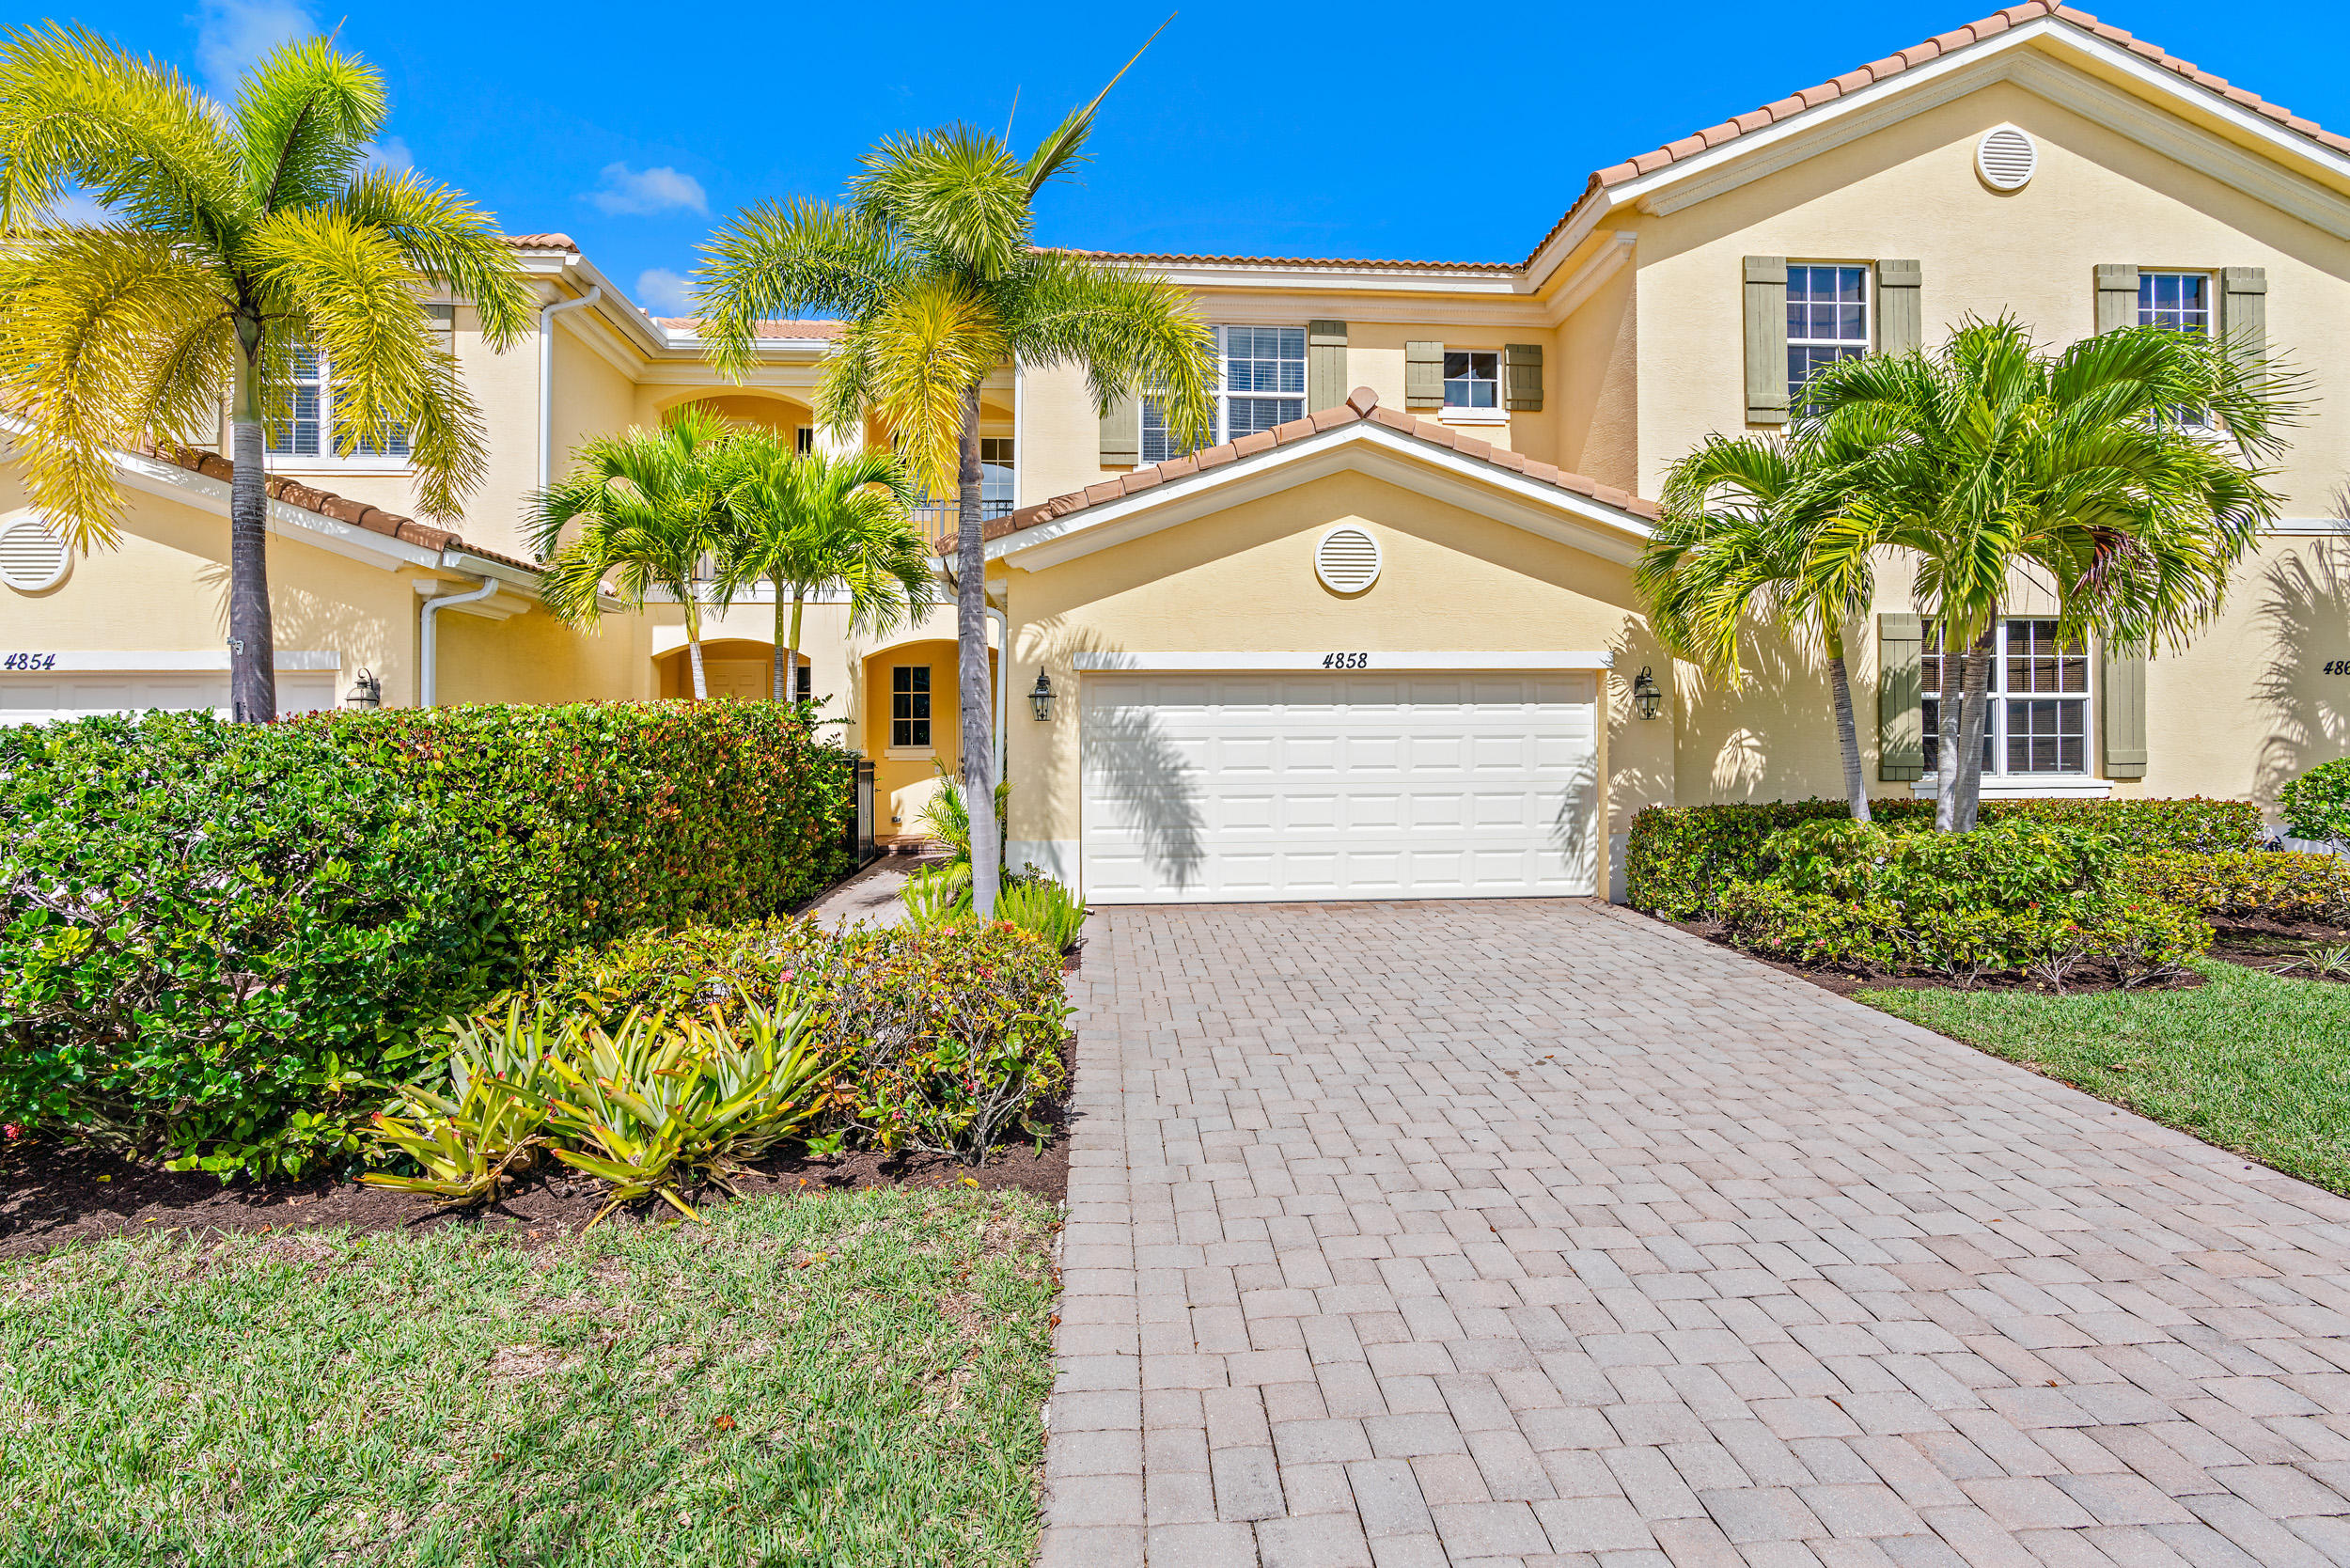 Photo of 4858 Cadiz Circle, Palm Beach Gardens, FL 33418